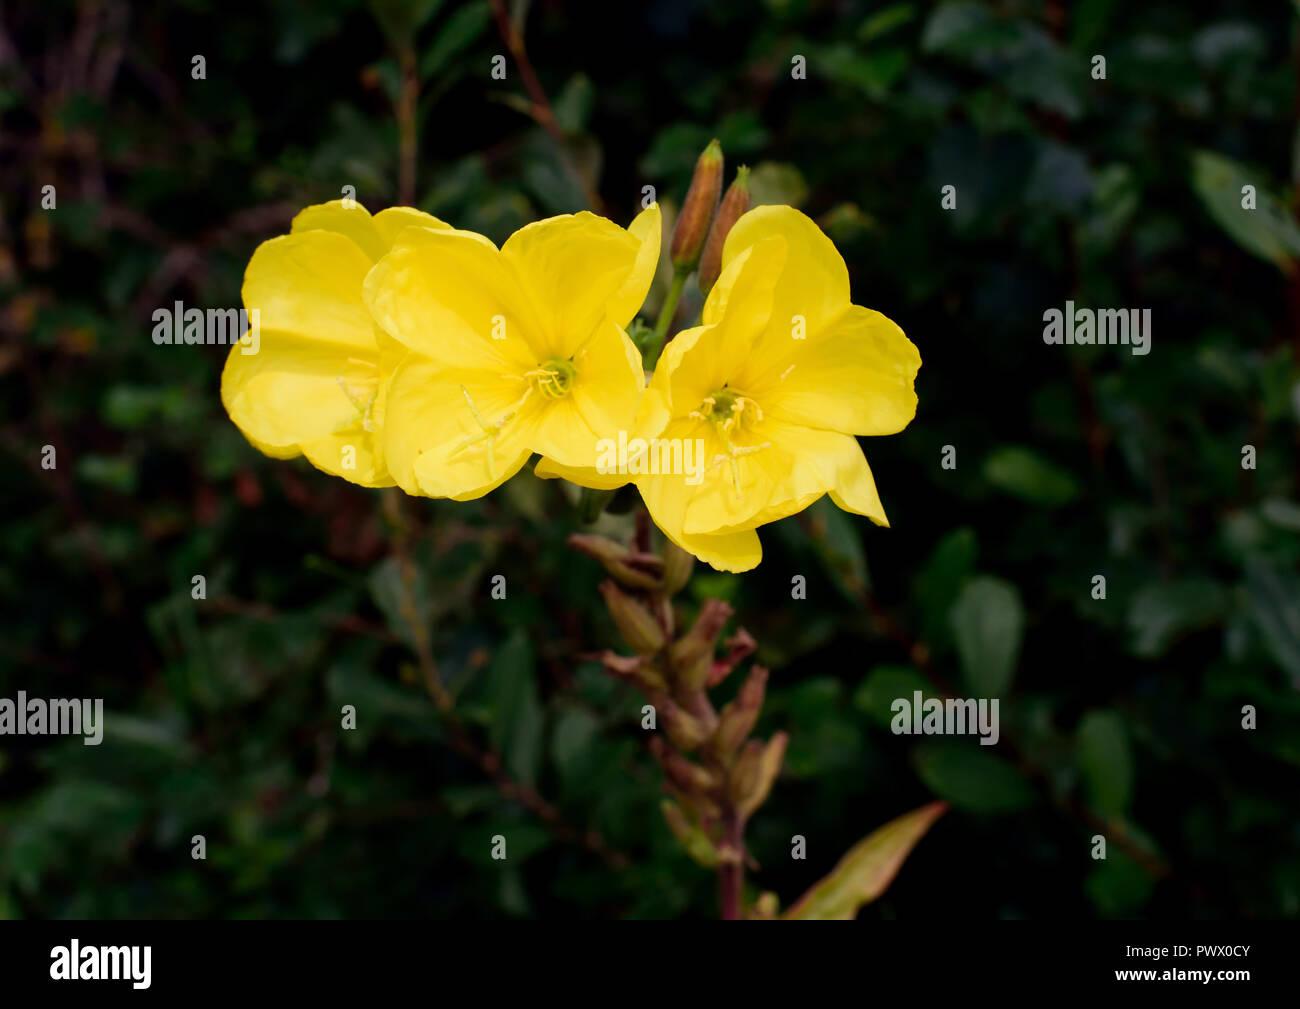 Evening Primrose Flowers Stock Photos Amp Evening Primrose